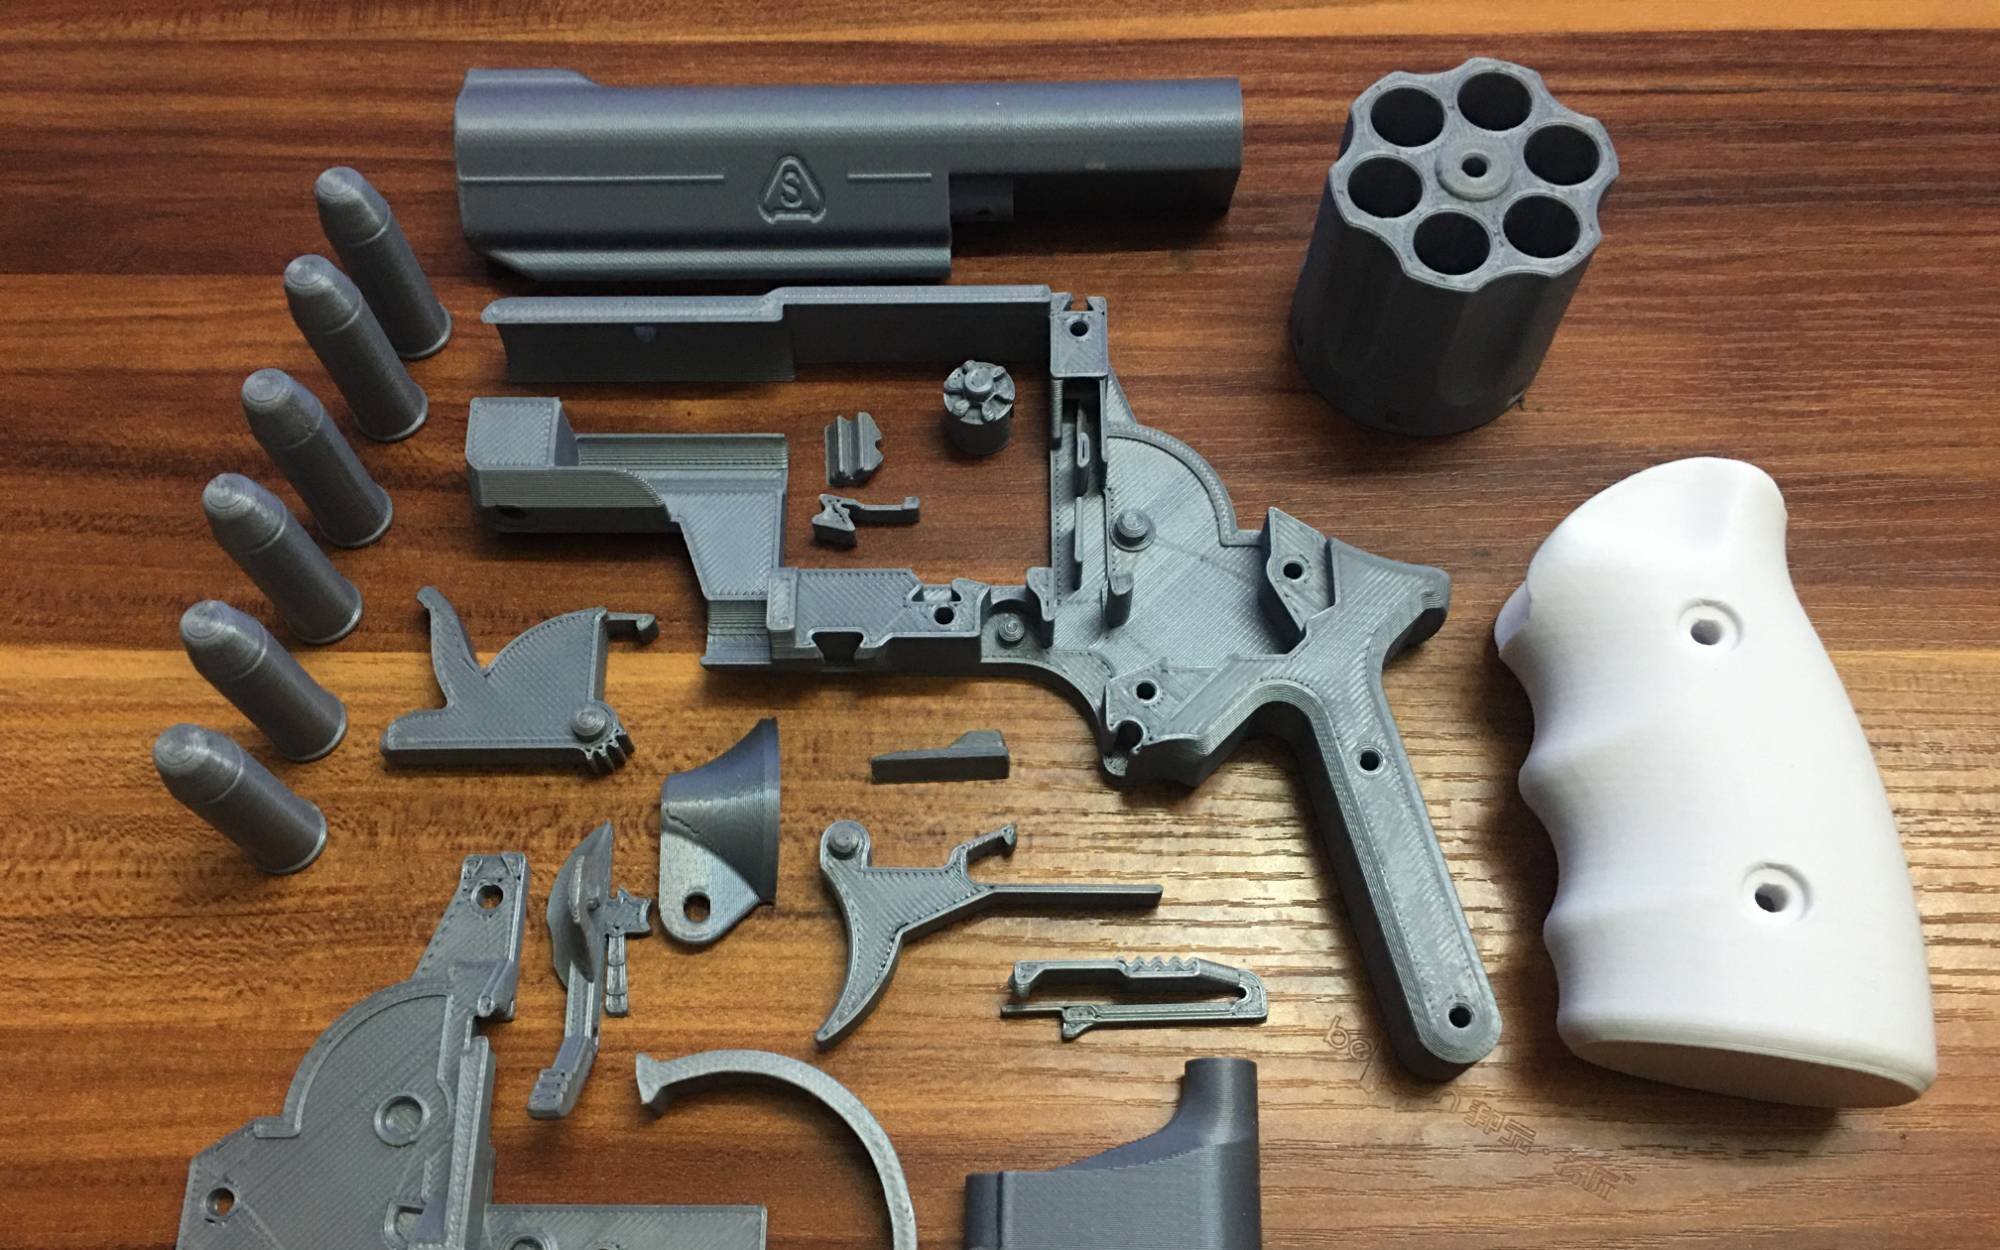 PROP 马格南/麥林.44 转轮/左轮 组立【3D打印 COSPlay 手办模型】